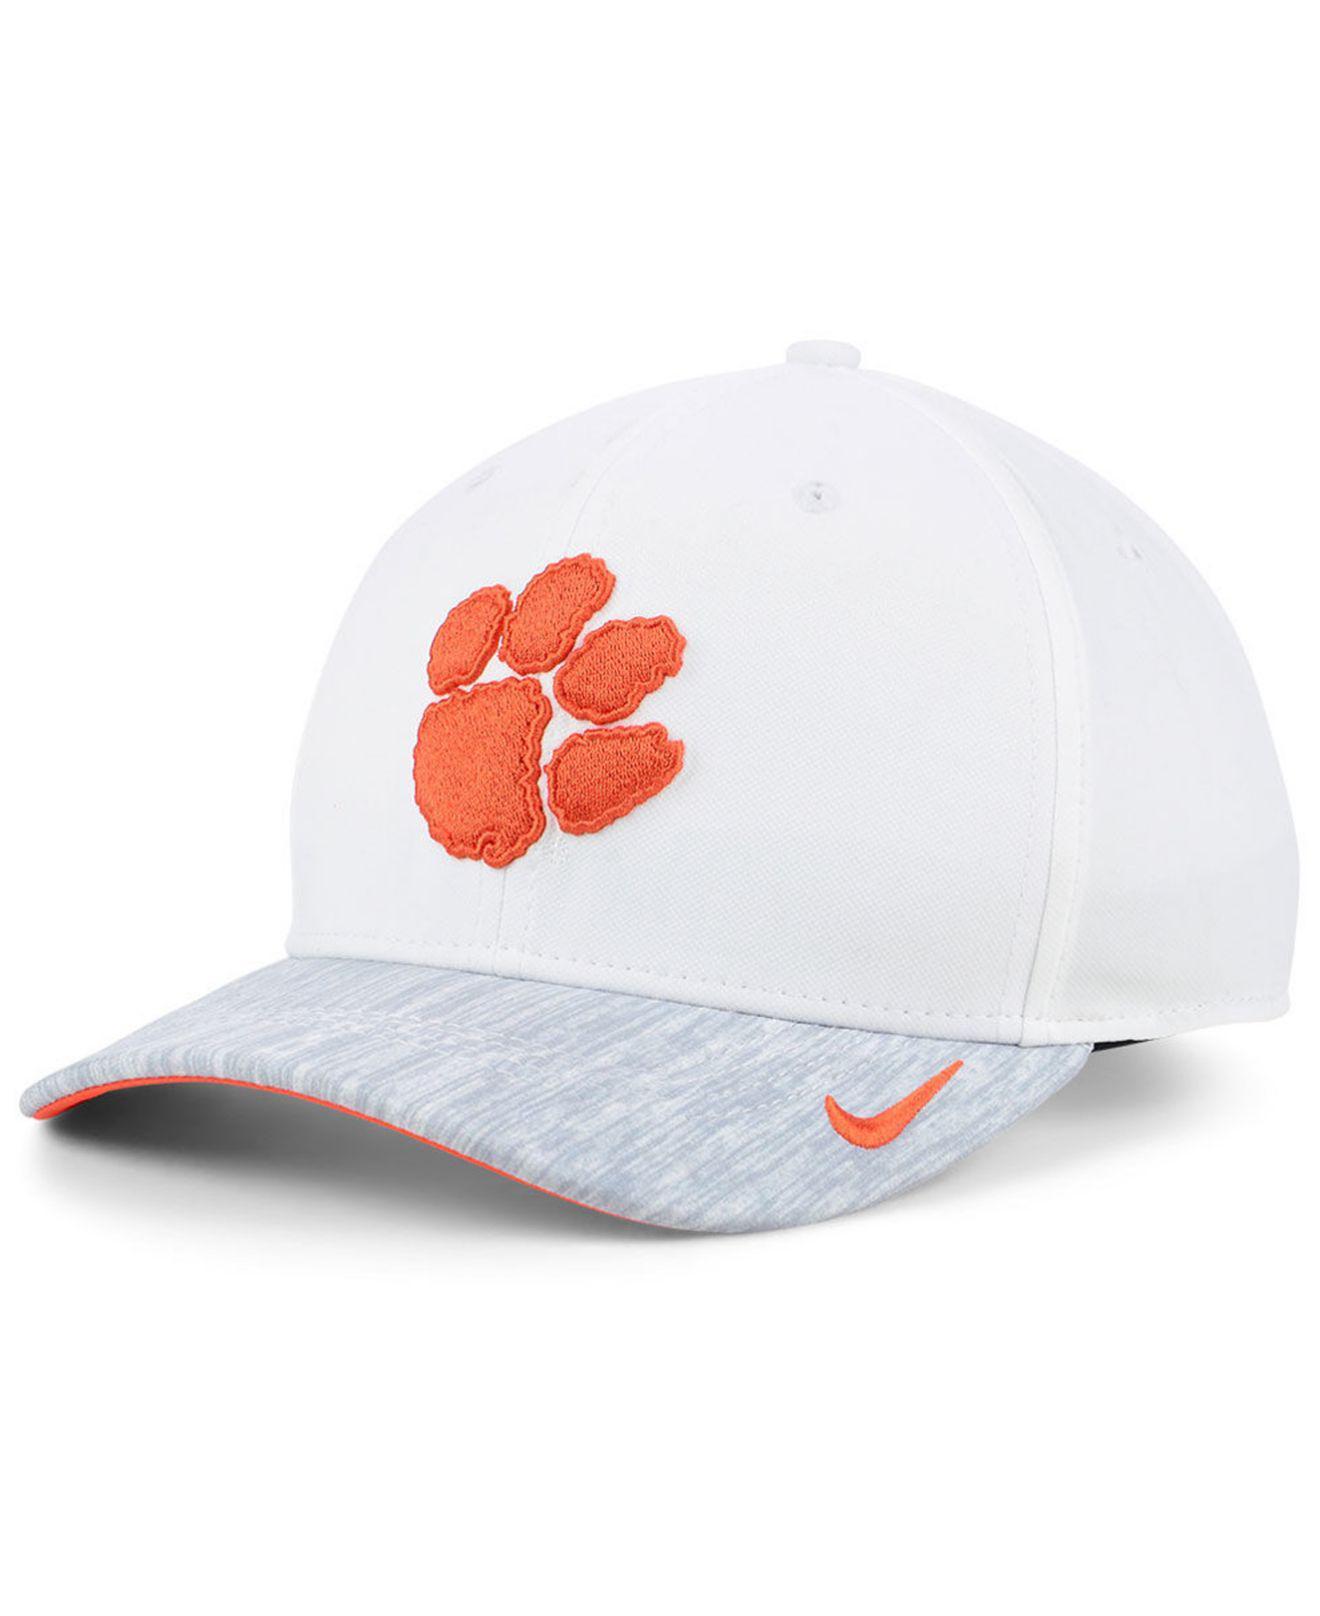 30a2f2b9b84b6 Lyst - Nike Clemson Tigers Arobill Swoosh Flex Cap in White for Men